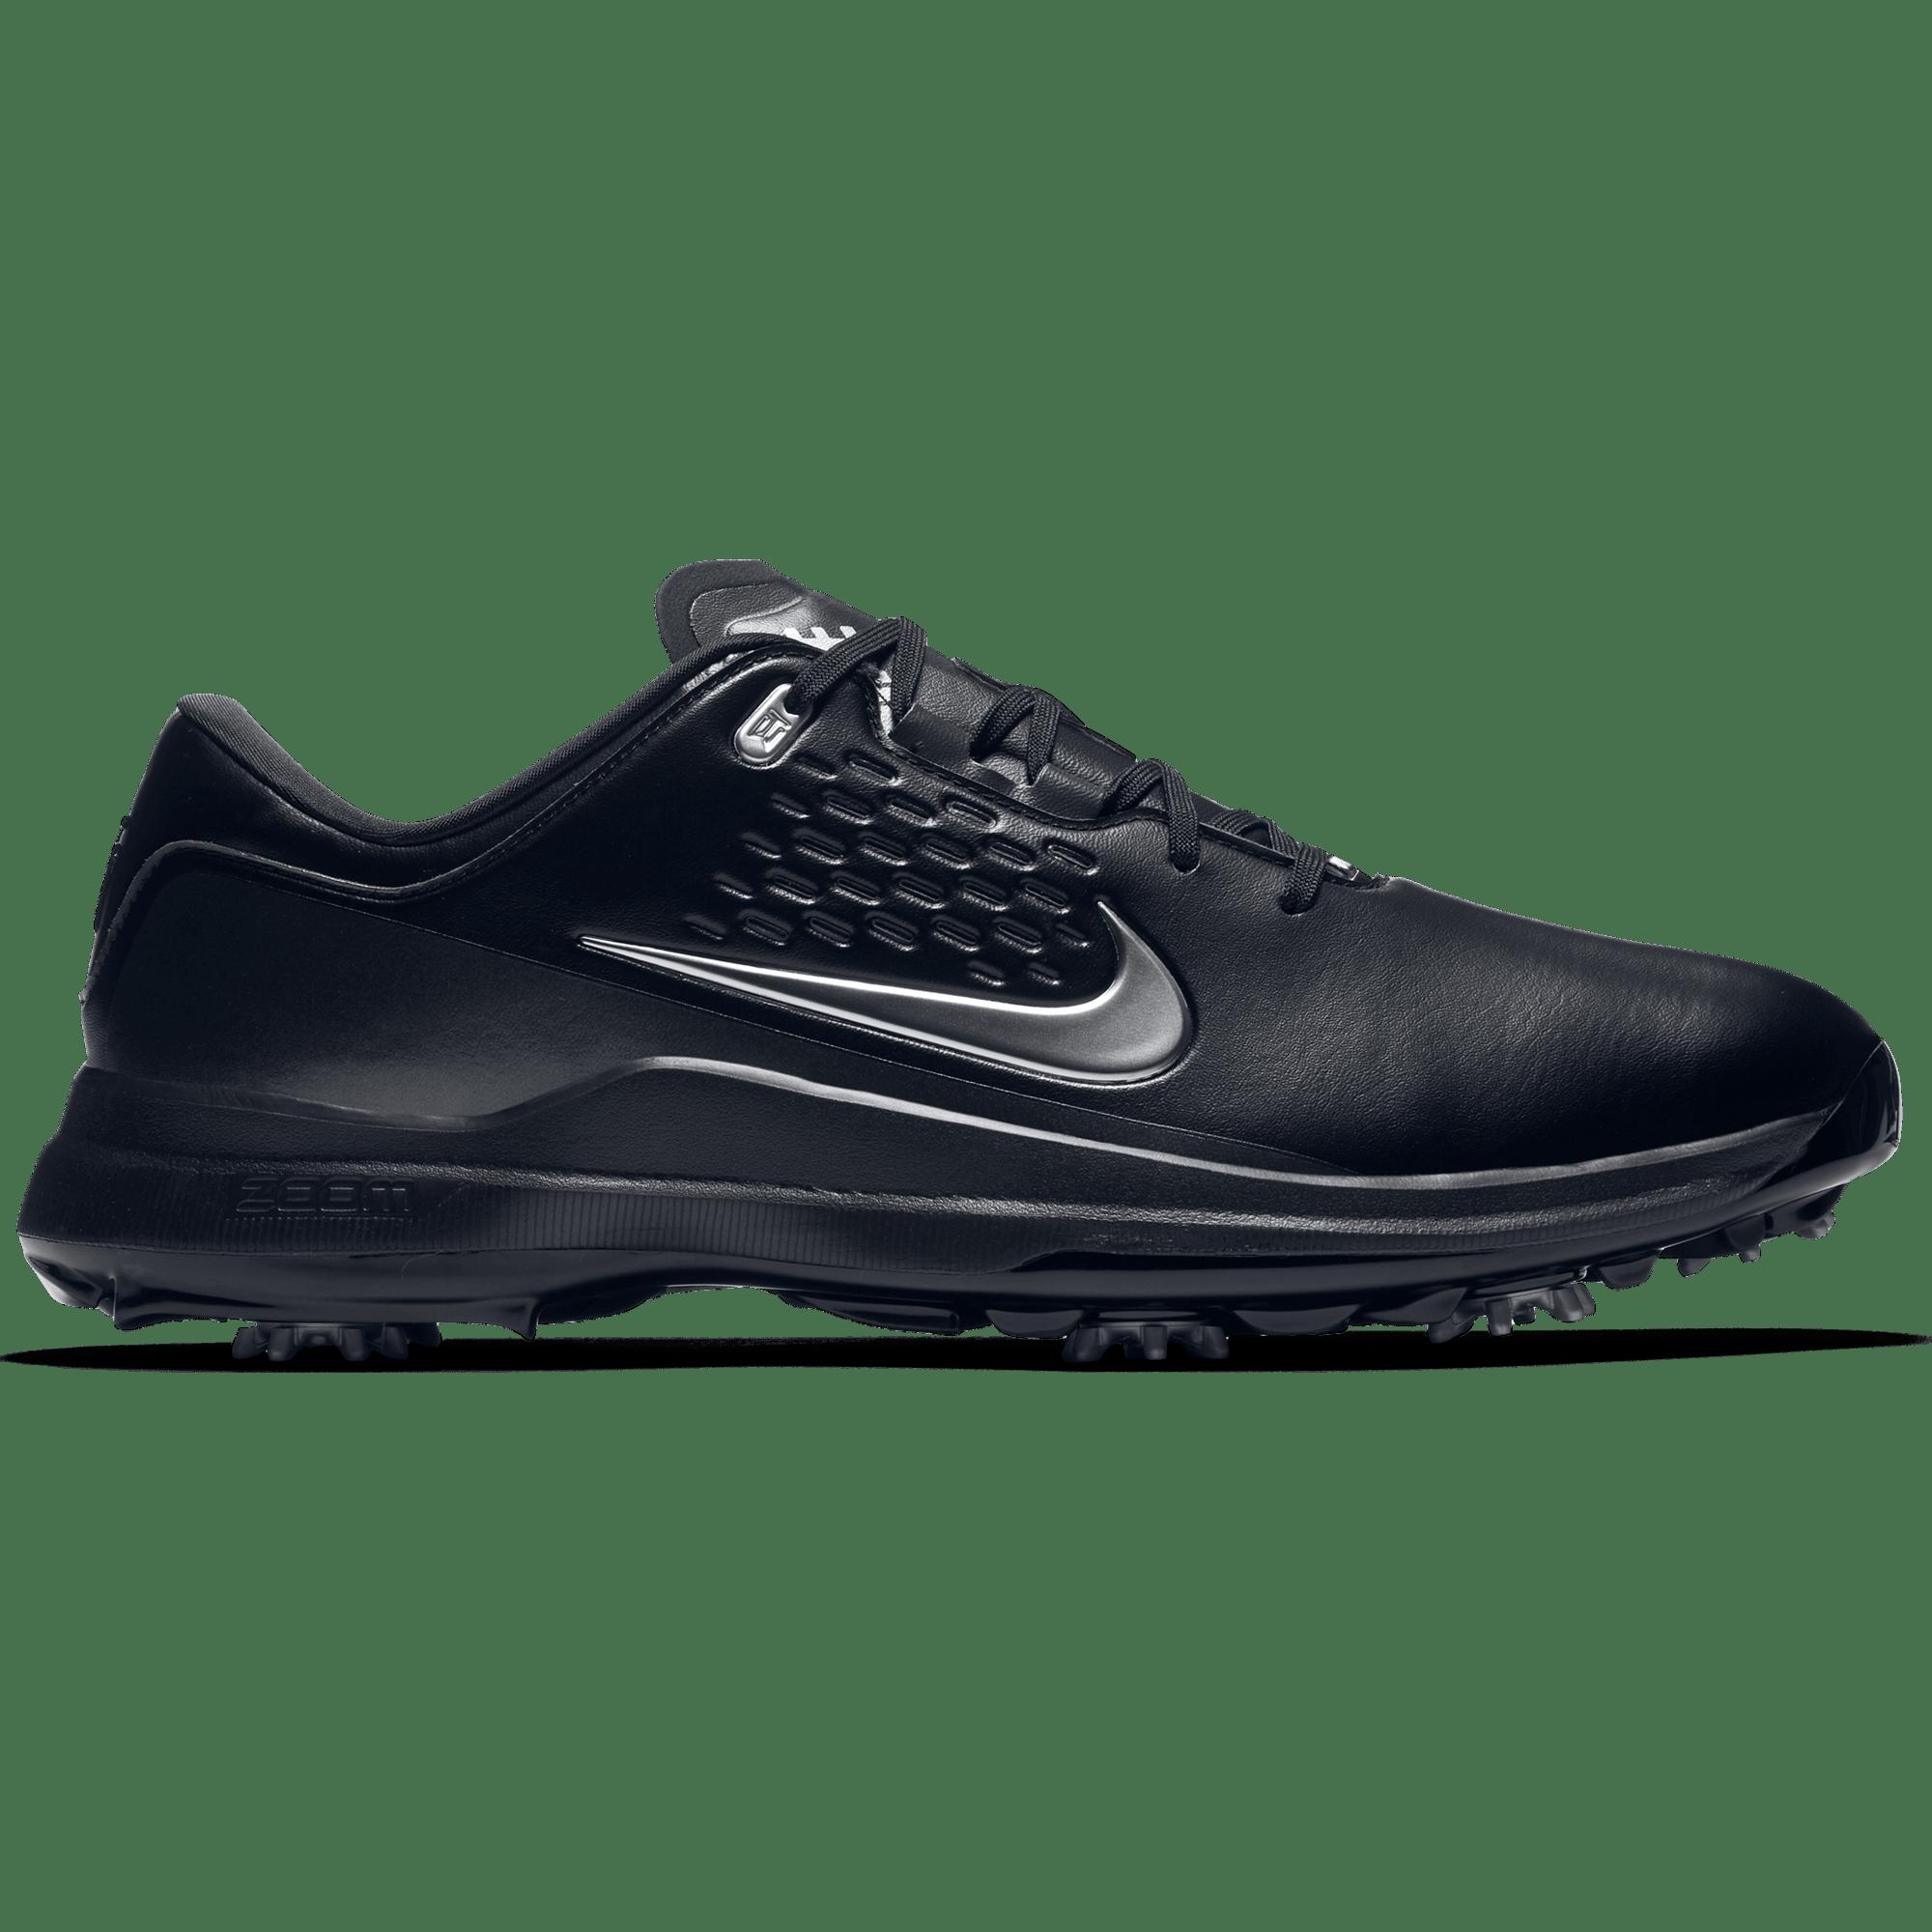 Nike Air Zoom TW71 Men's Golf Shoe